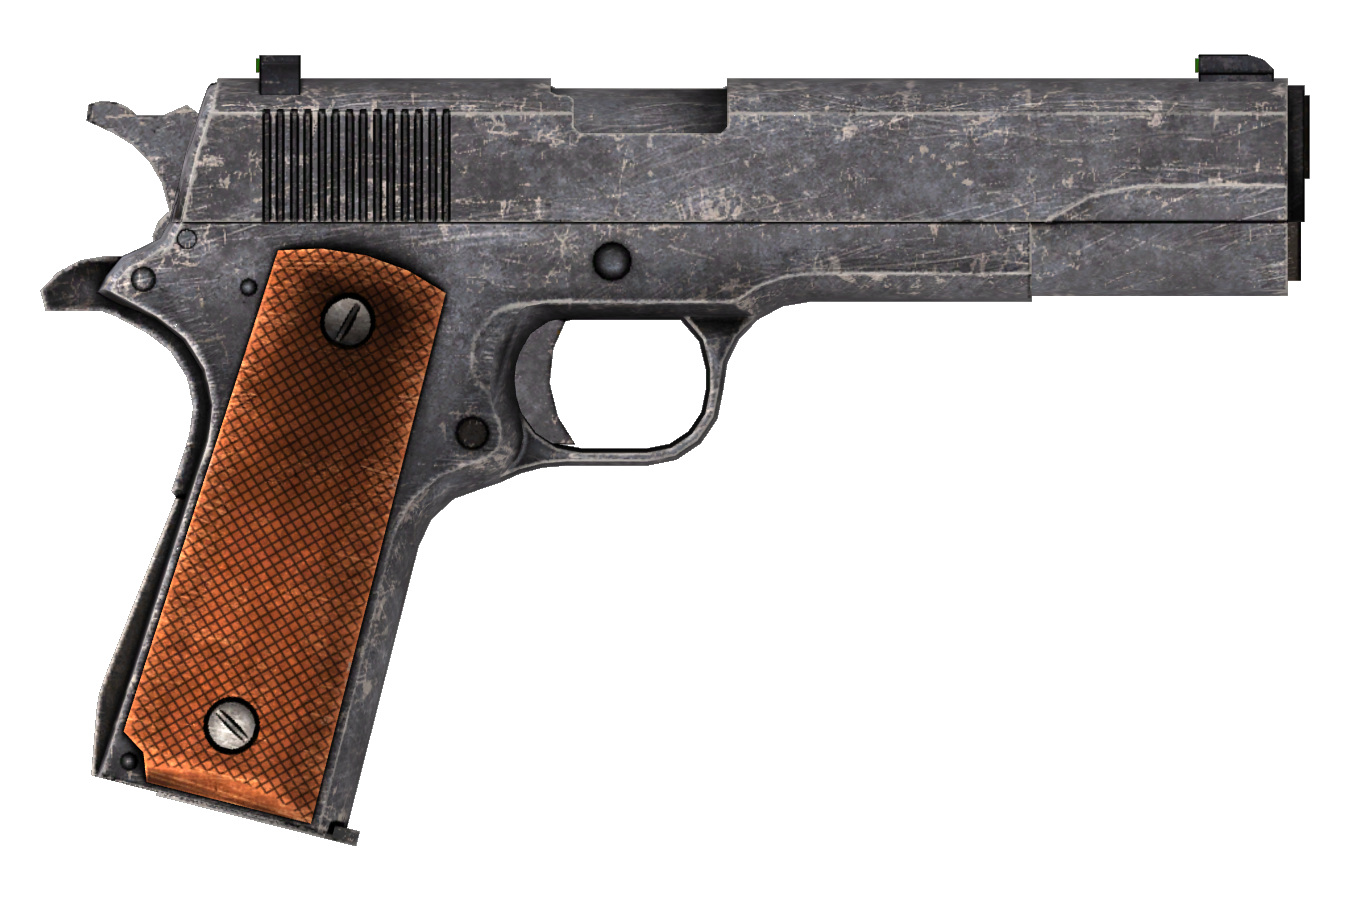 45 Auto pistol | Fallout Wiki | FANDOM powered by Wikia